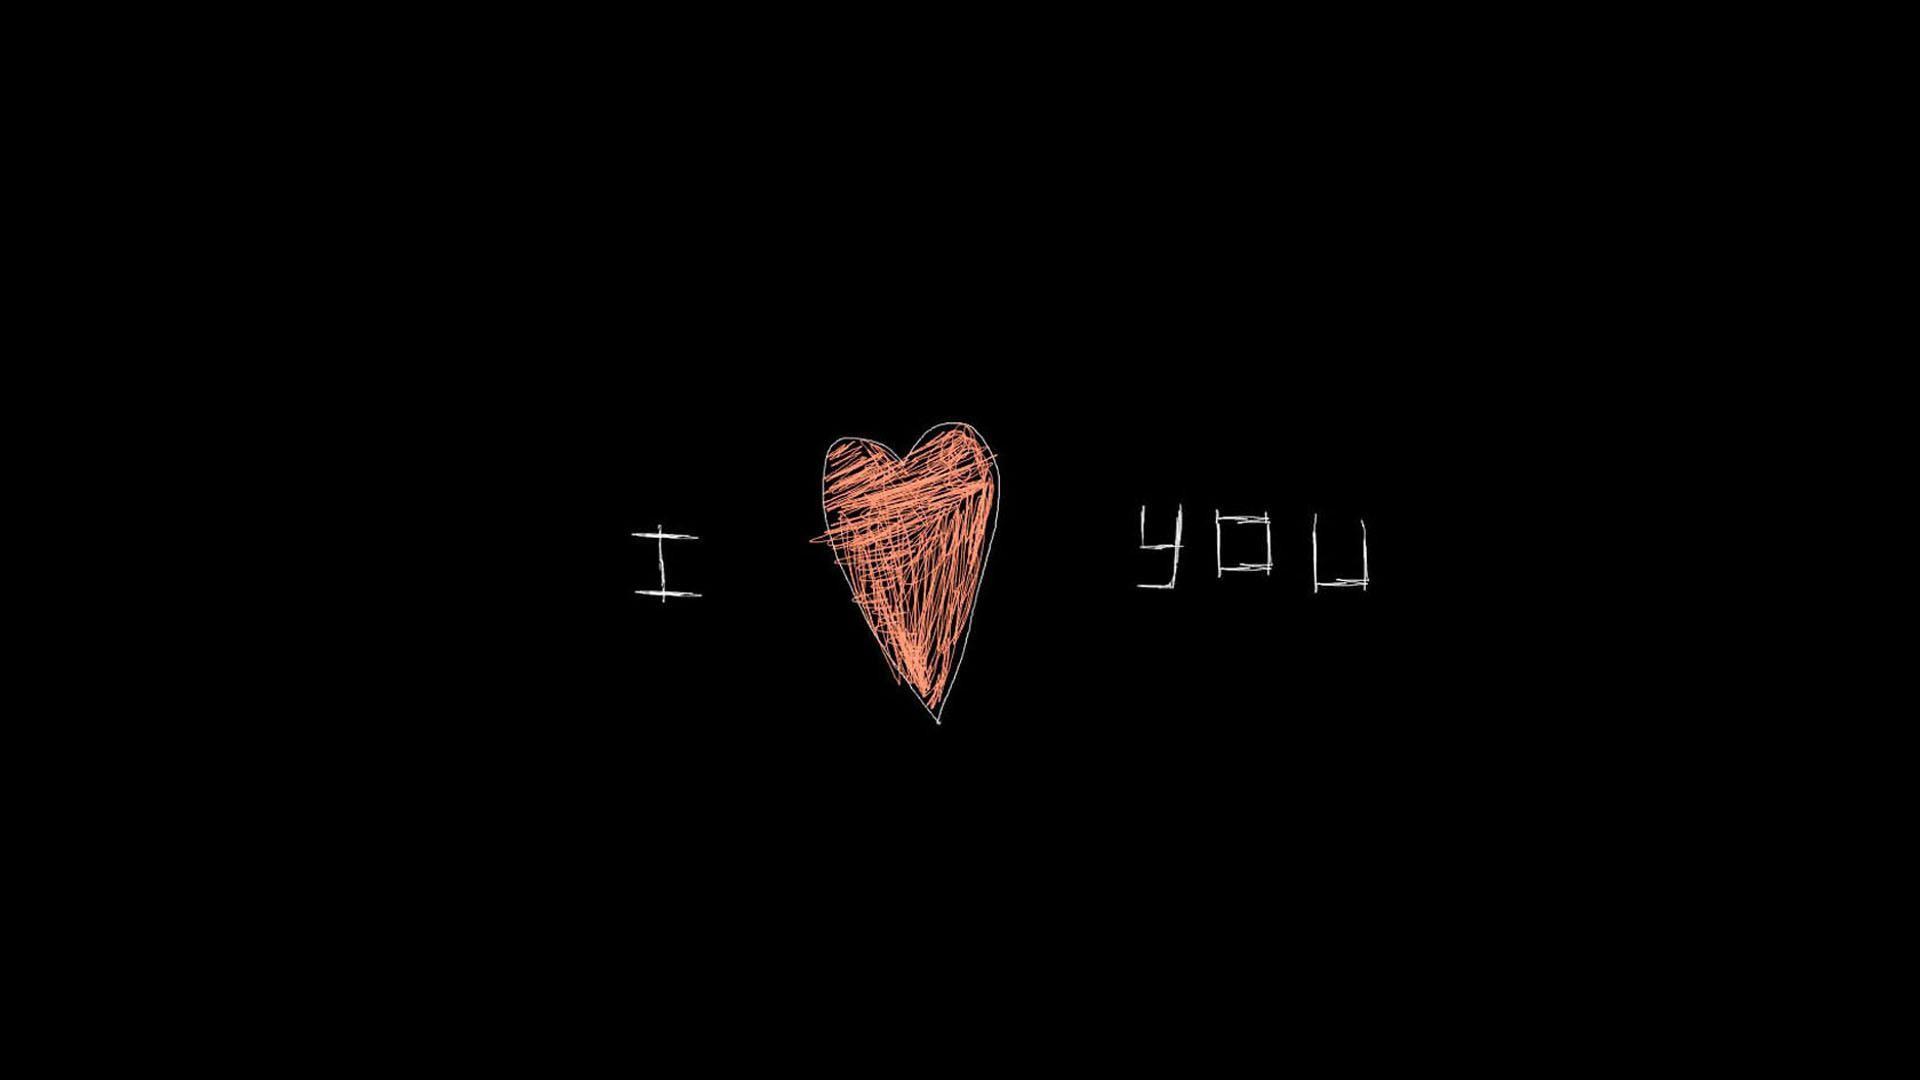 I Love You Heart Art HD Wallpaper